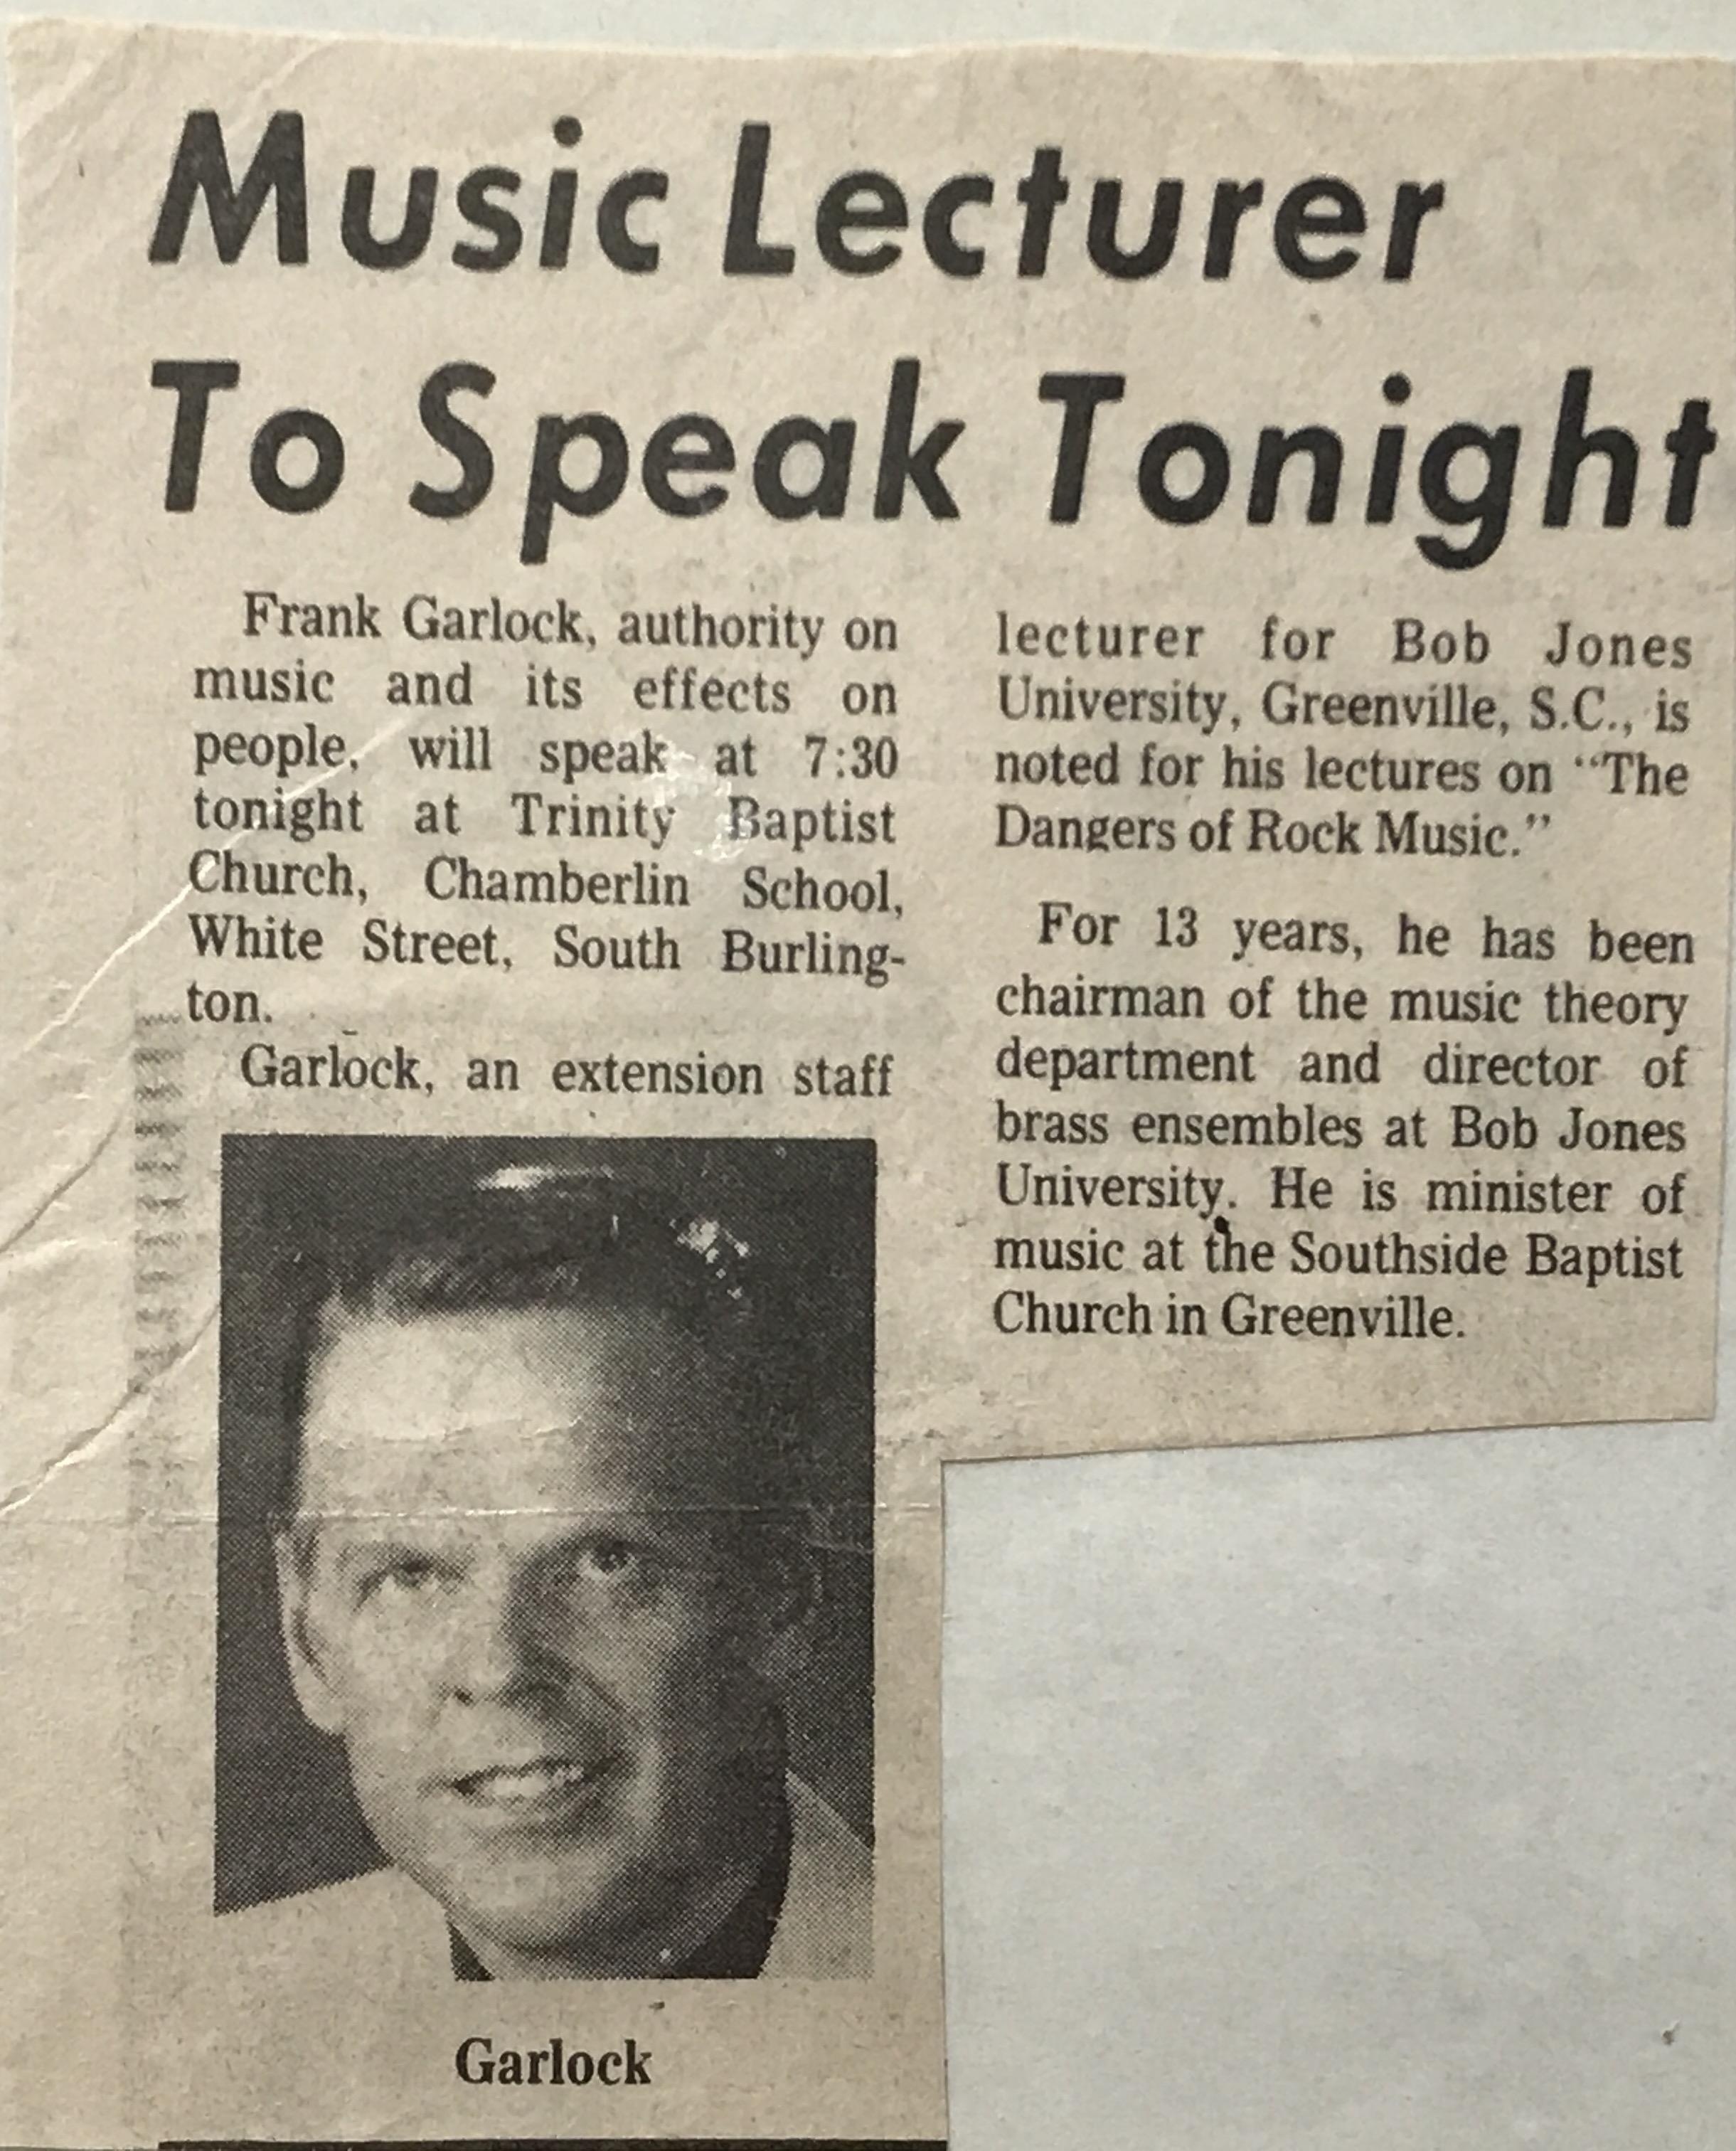 Frank Garlock, Speaker